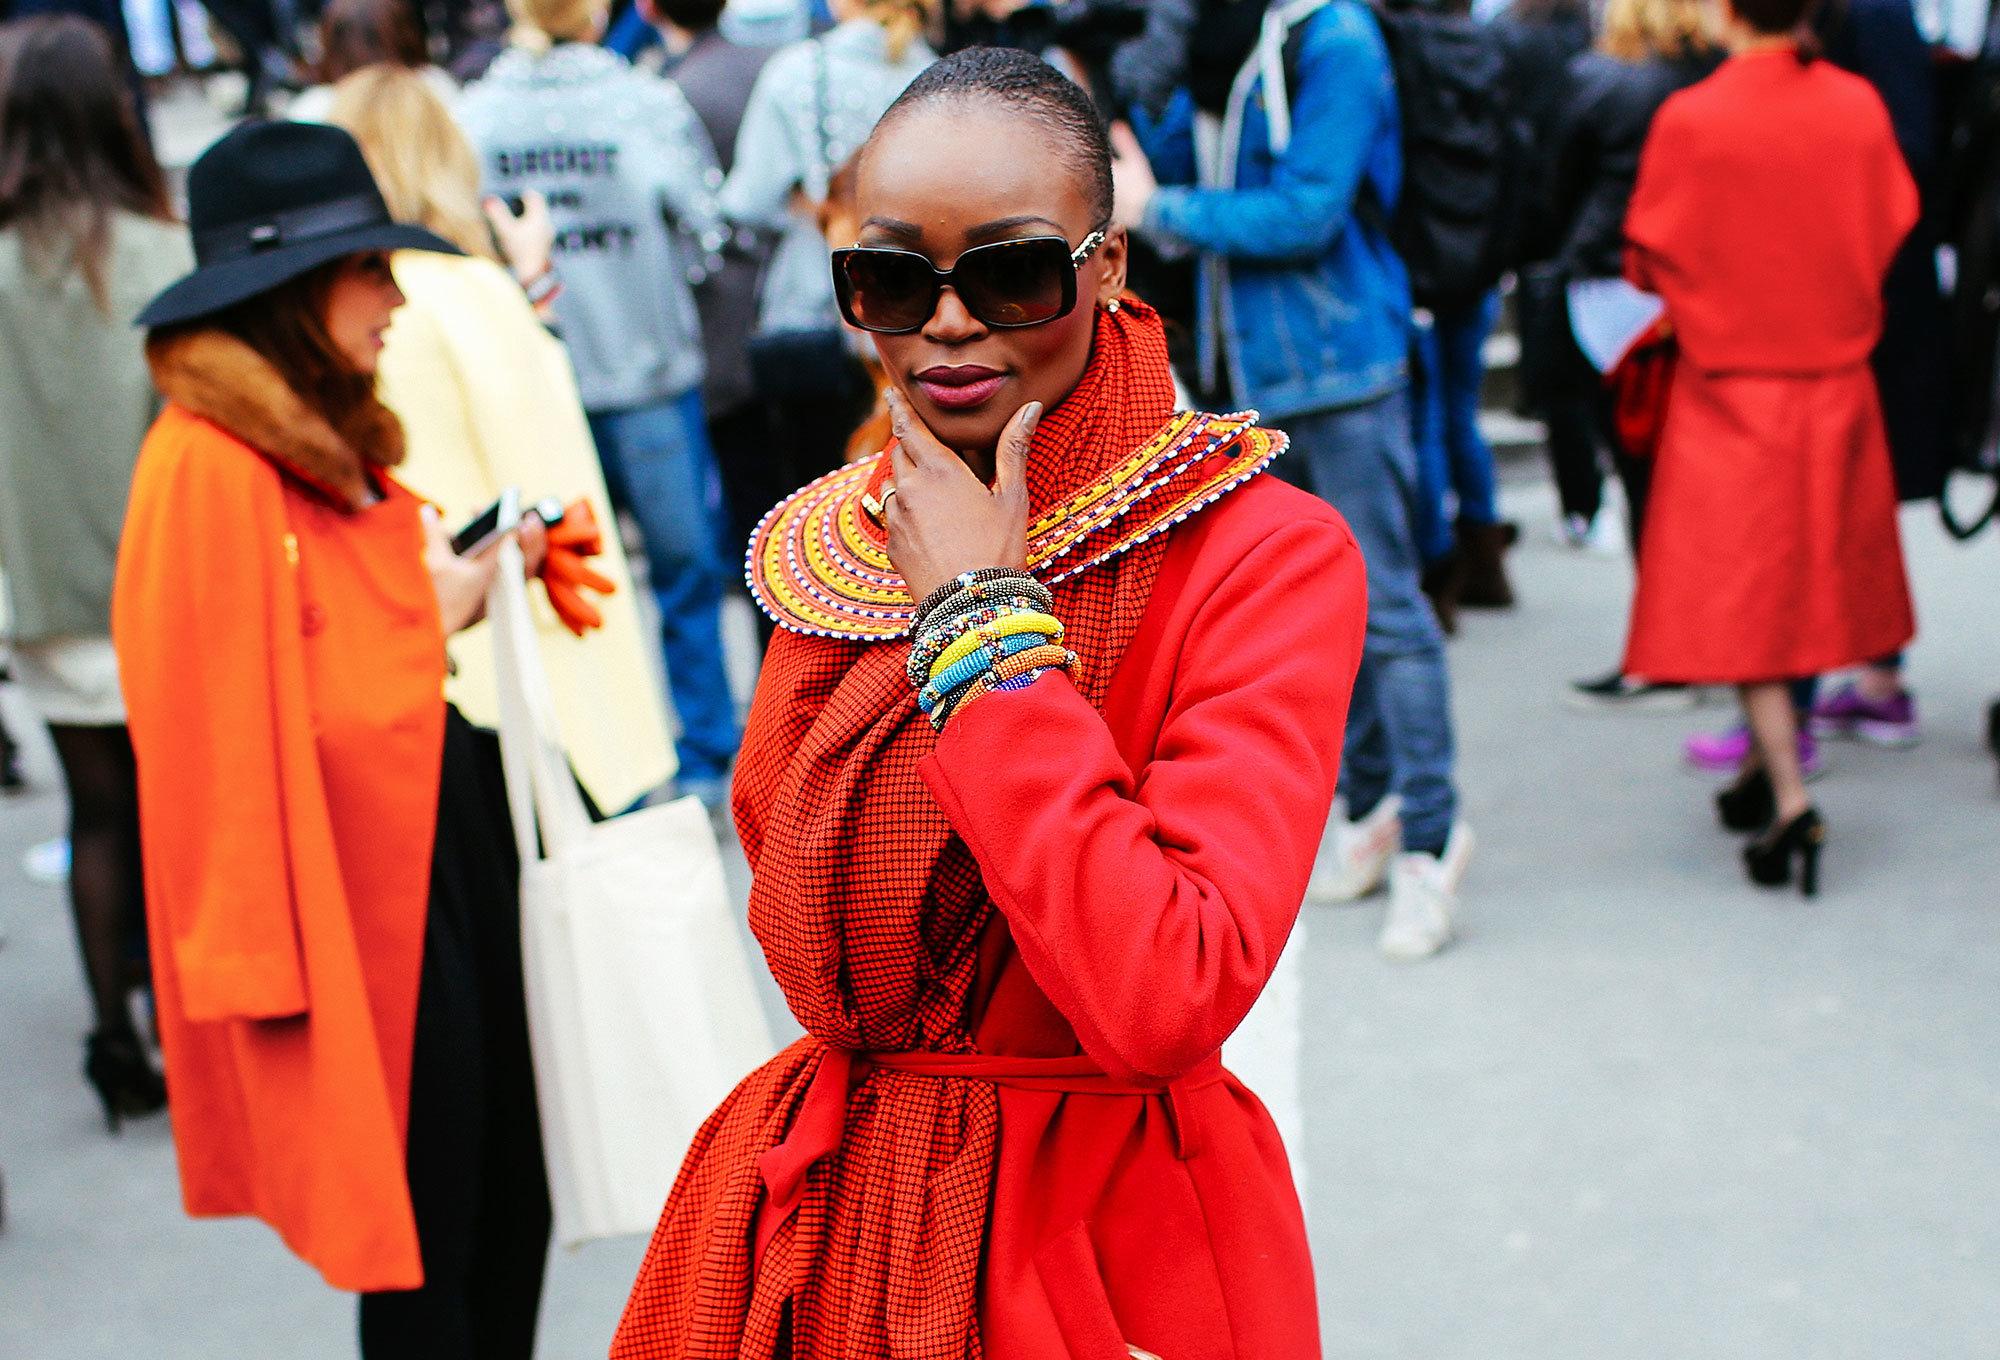 parij street style etno individualism